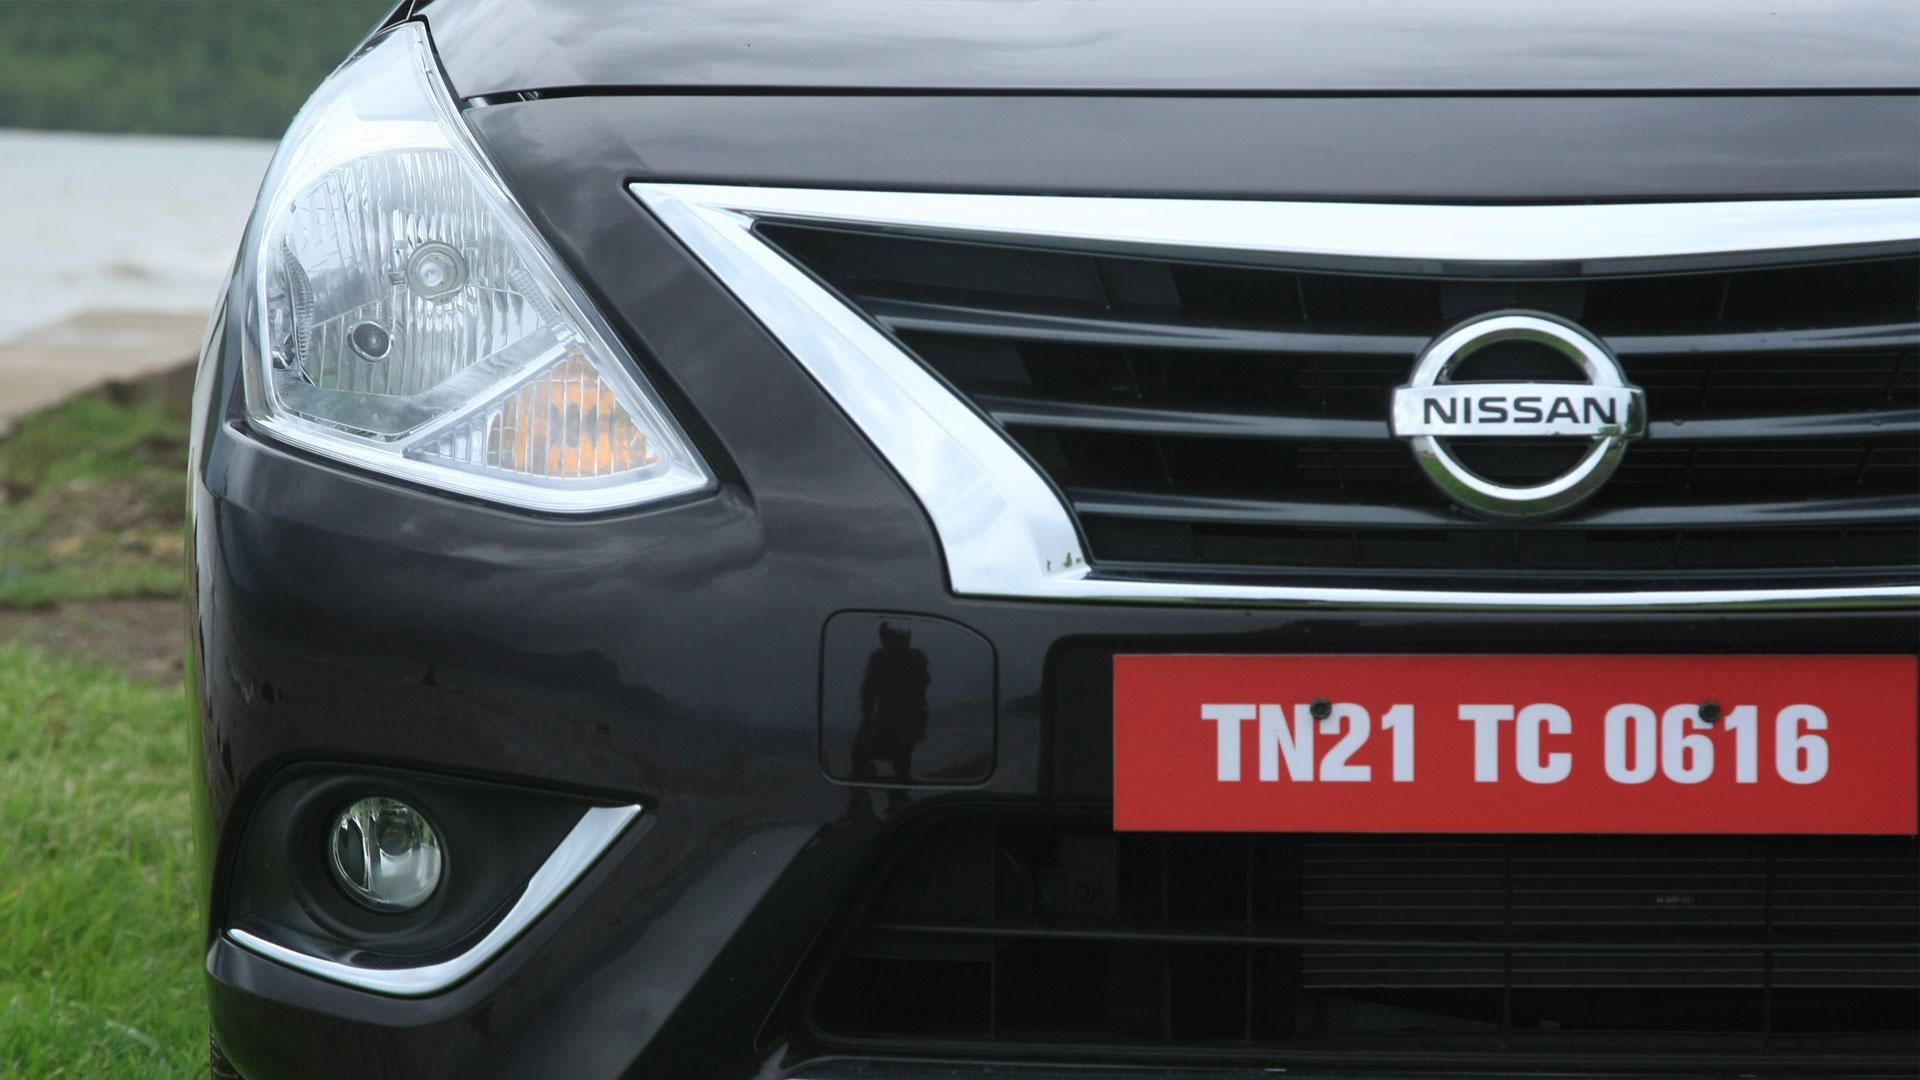 Nissan Sunny 2014 Exterior